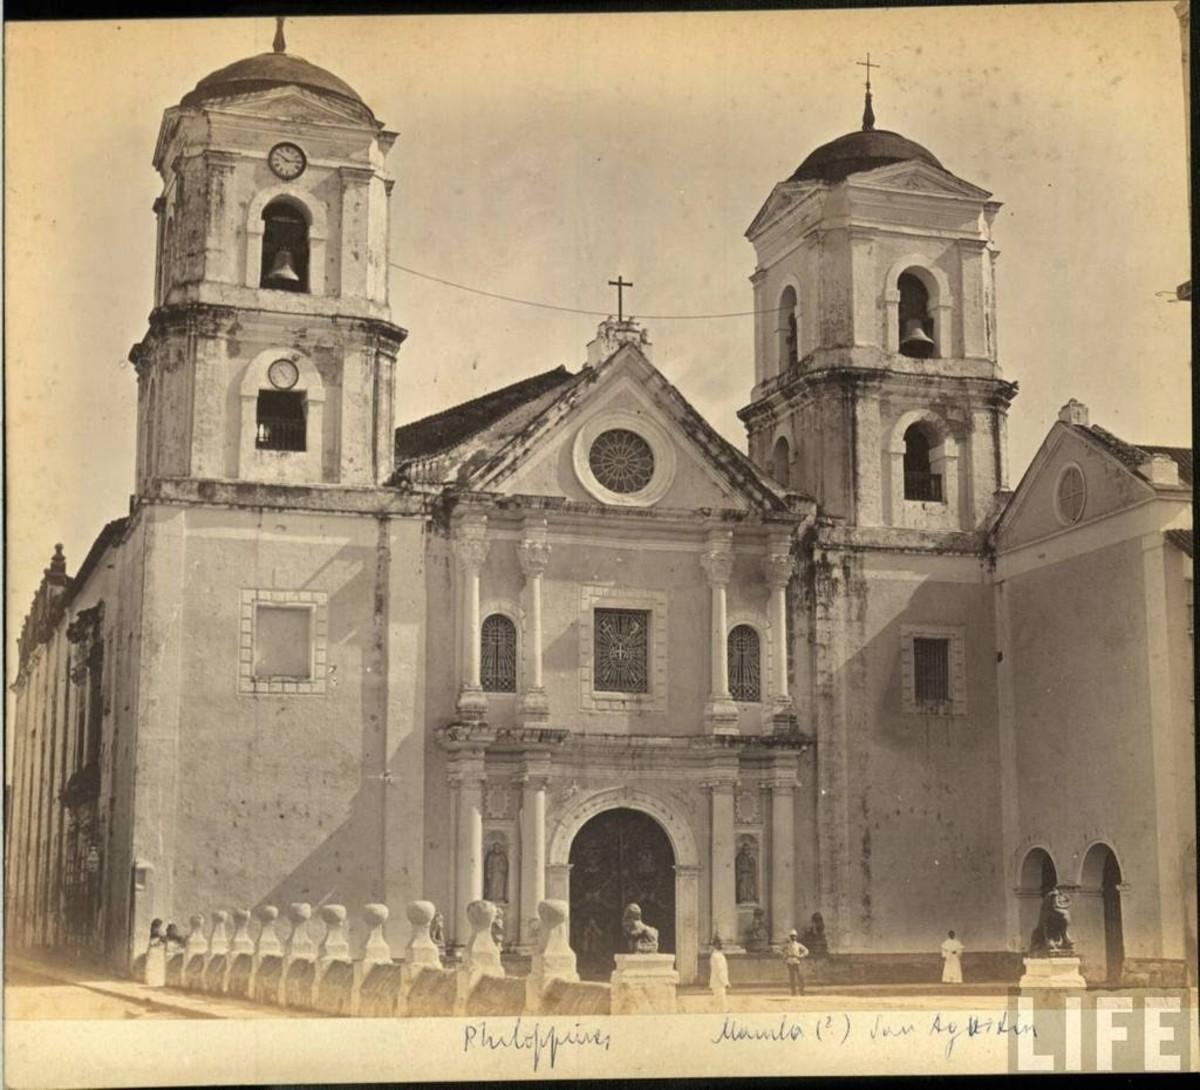 San Agustin Church before the destructive 1880 Luzon earthquake (Photo credit: goldwinlovesvina.wordpress.com)